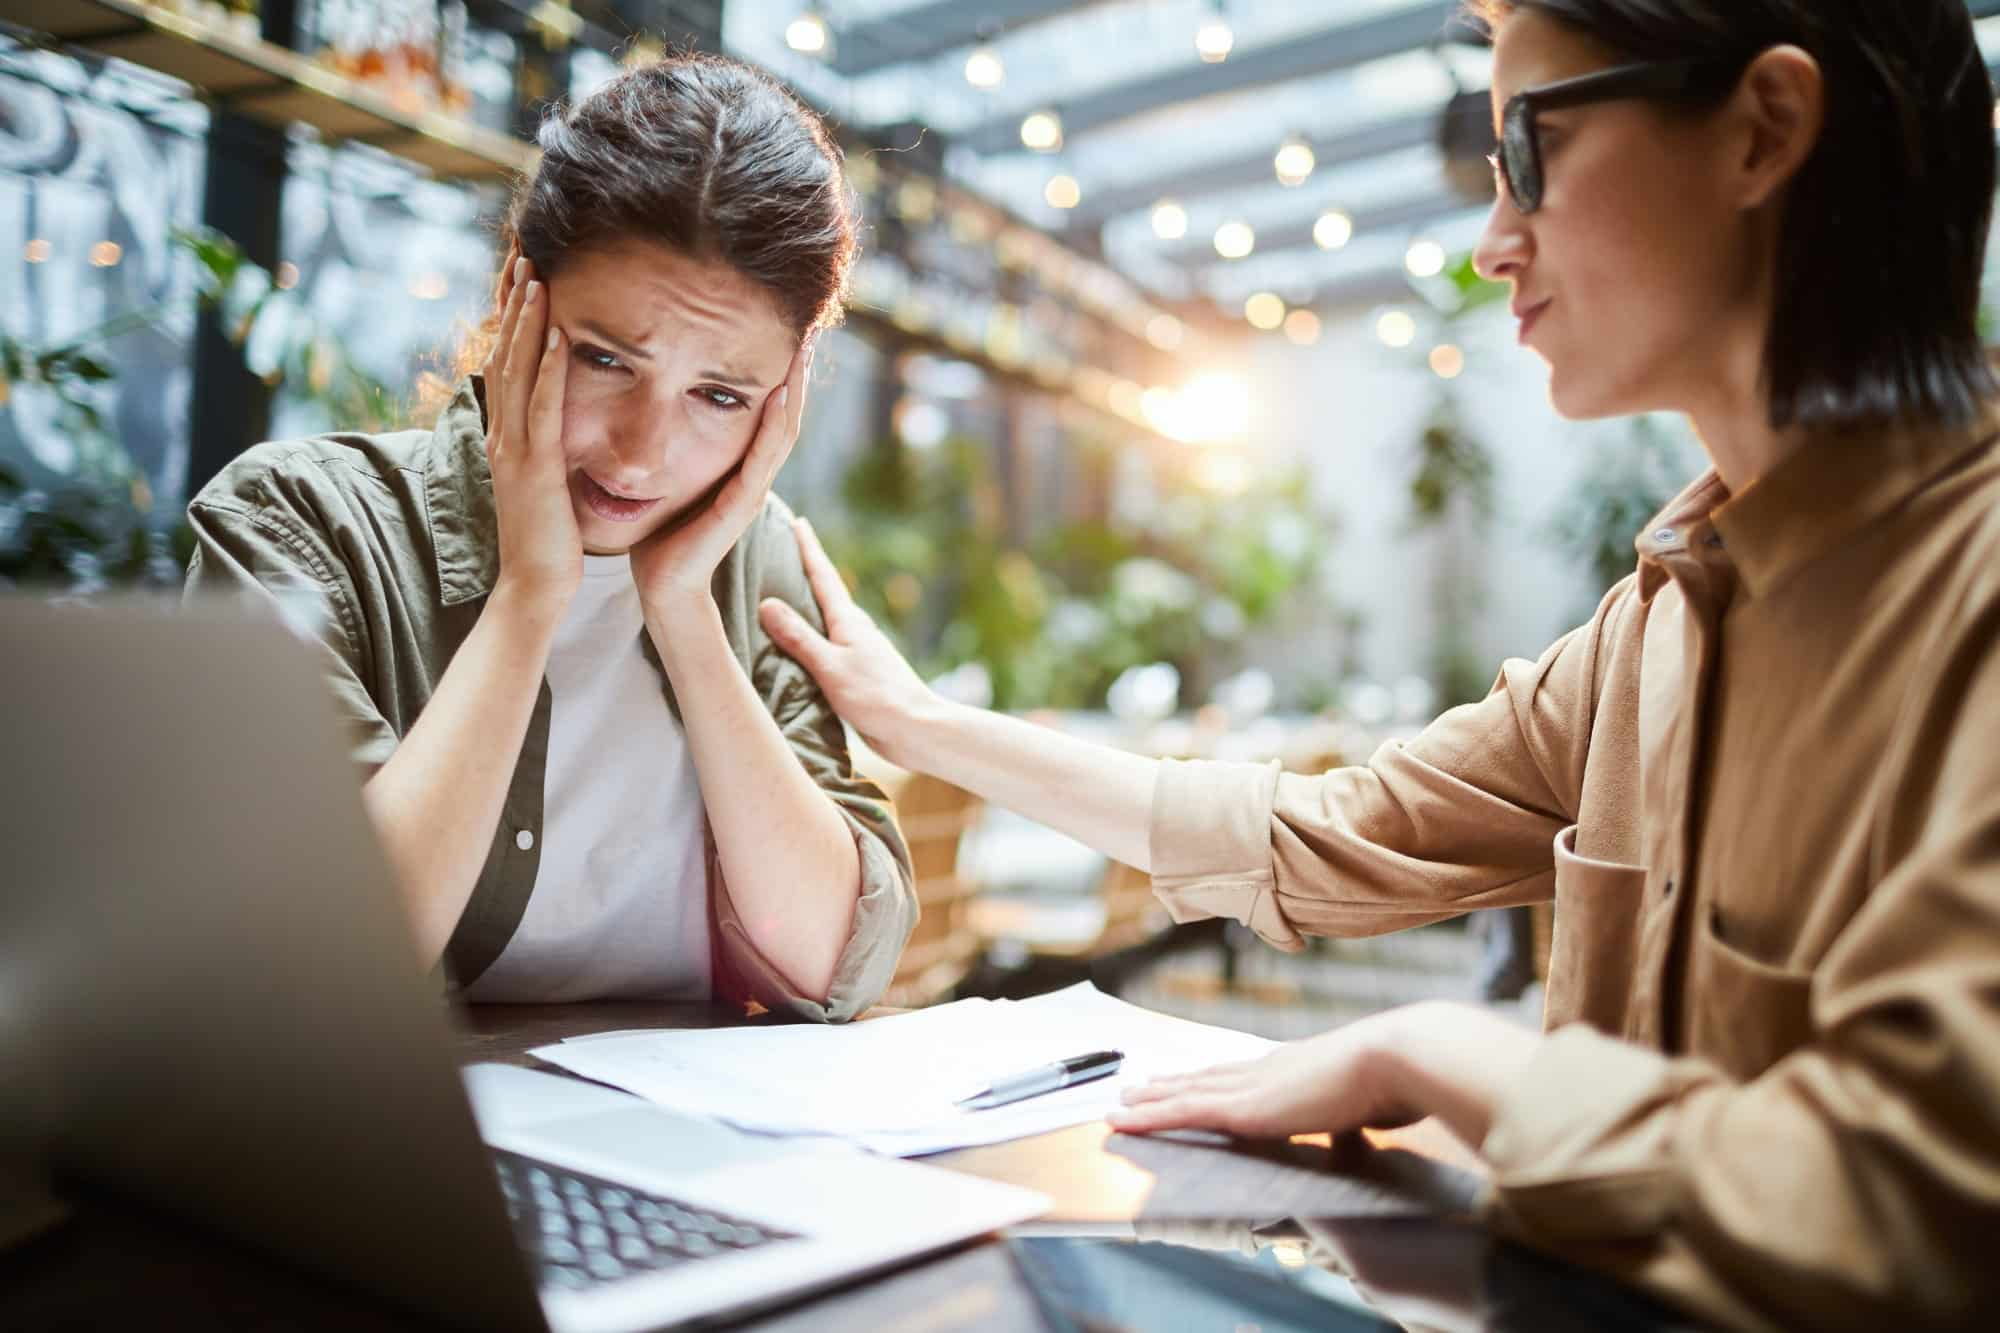 Avoid Derailing Your Restaurant Business Sale